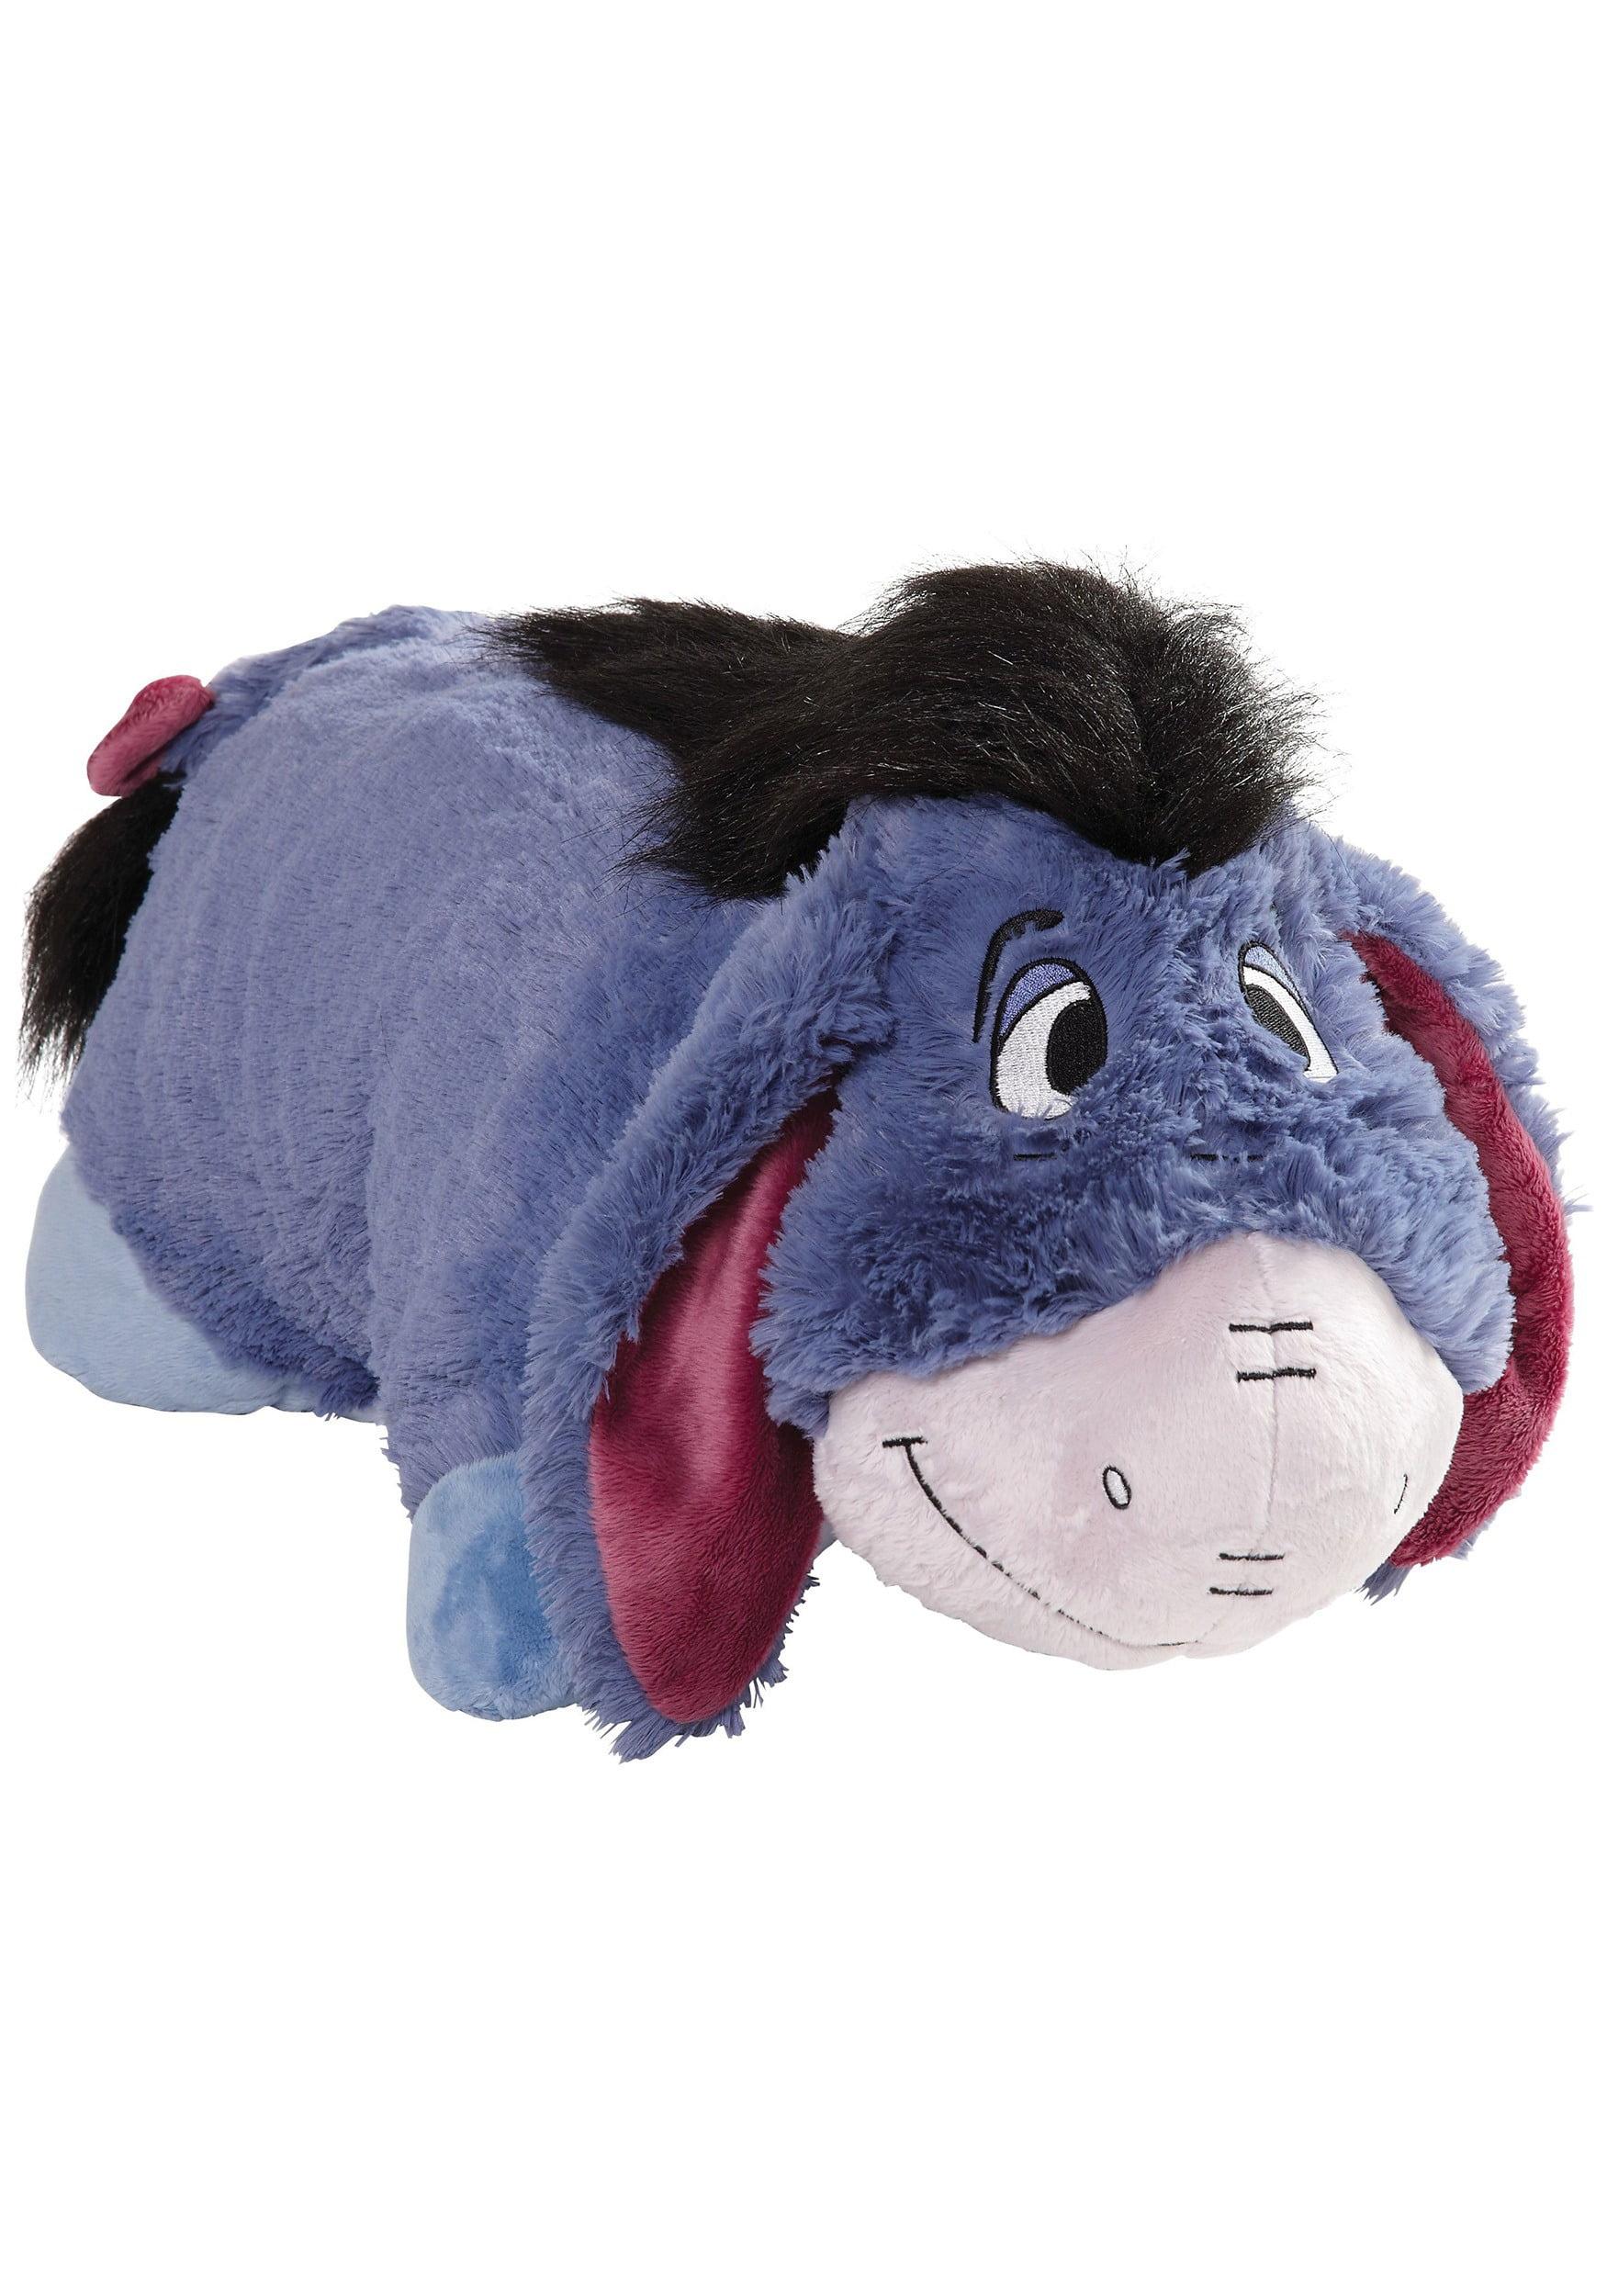 "Winnie the Pooh Eeyore 16"" Pillow Pet by Pillow Pets"